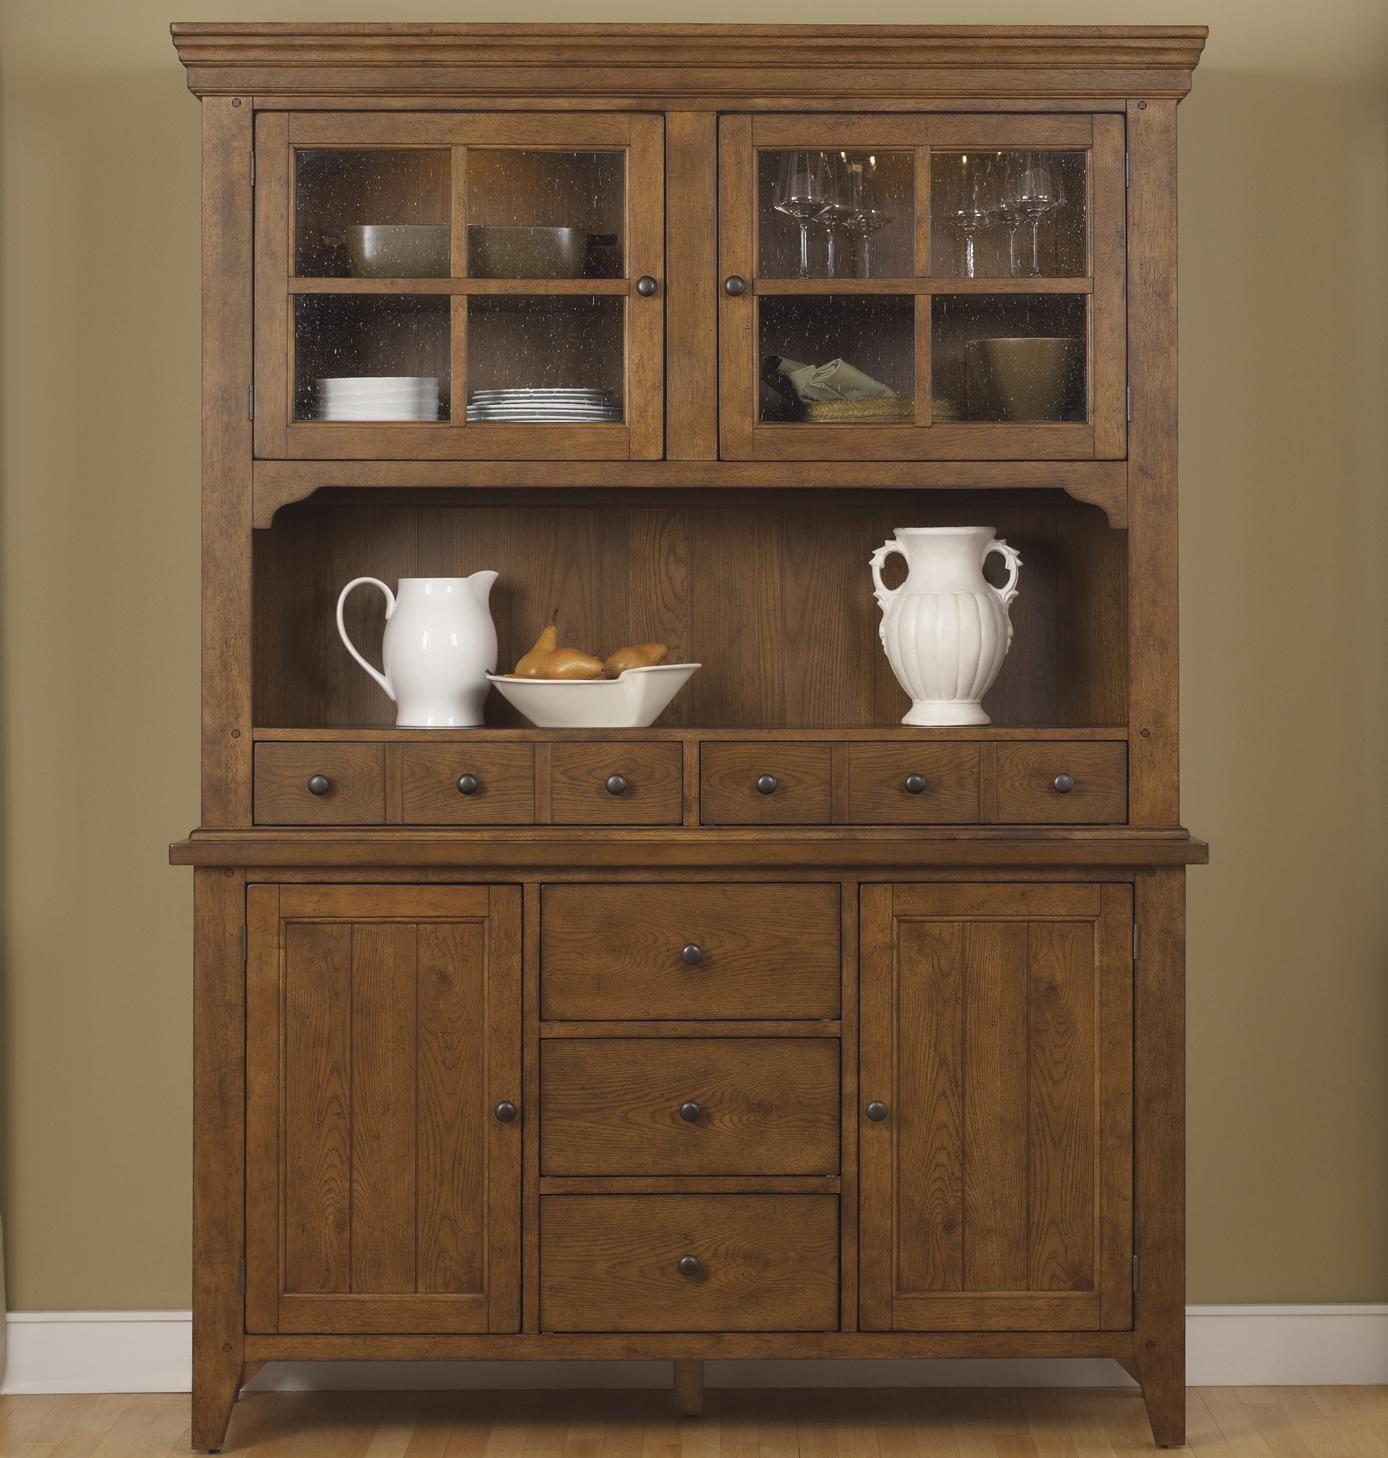 Hearthstone Hutch Dining Room CabinetsBathroom